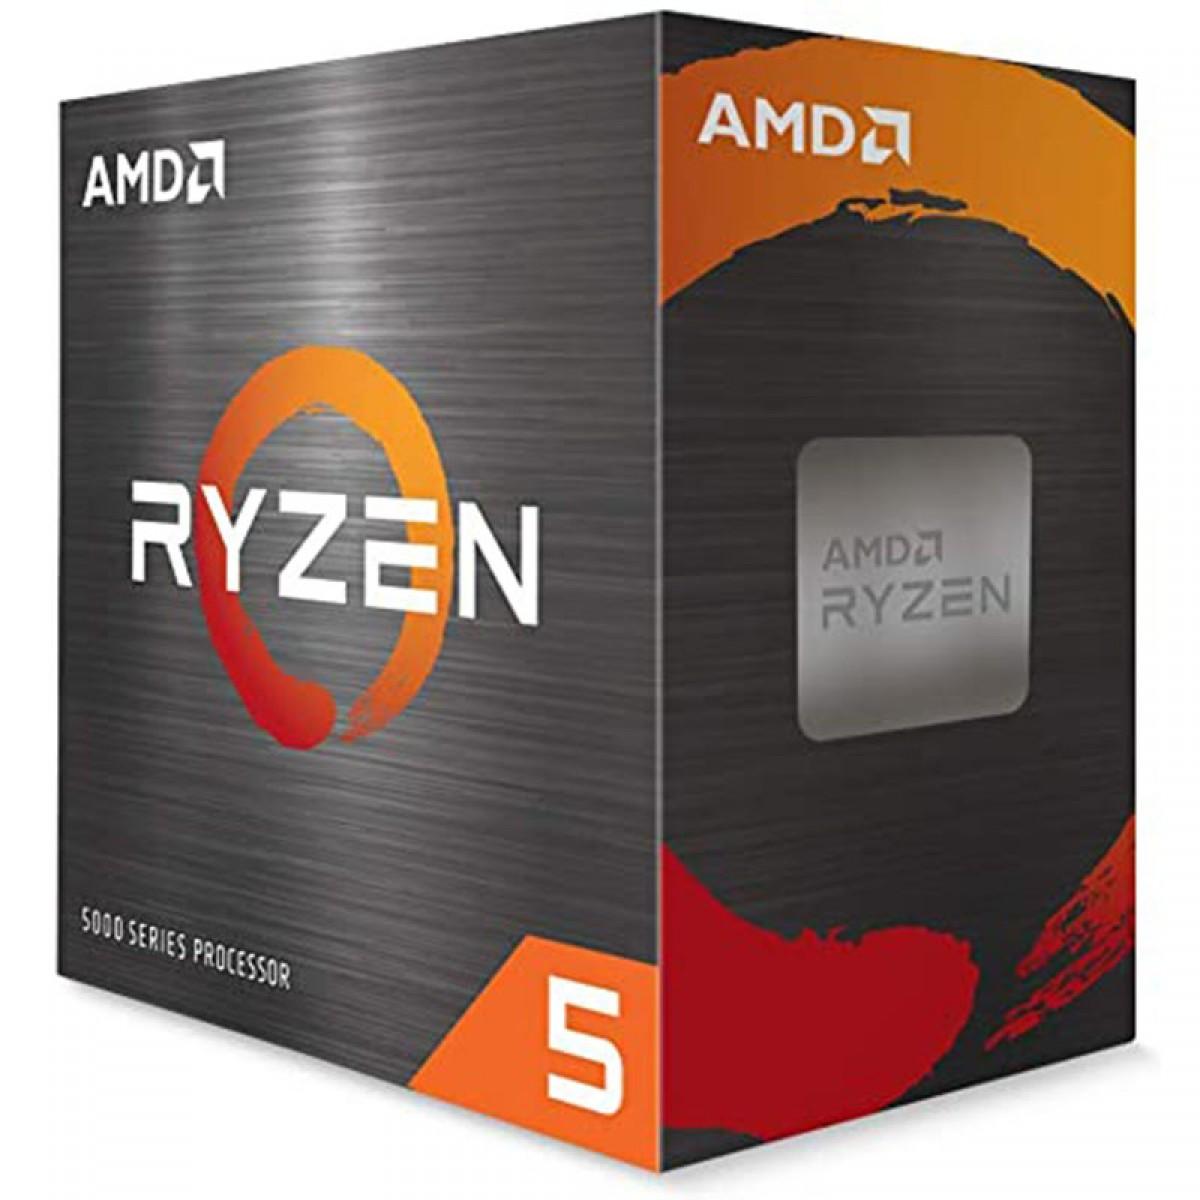 Kit Upgrade, ASUS TUF Gaming X570-PLUS + AMD Ryzen 5 5600G + Memória DDR4, 8GB/3000MHz